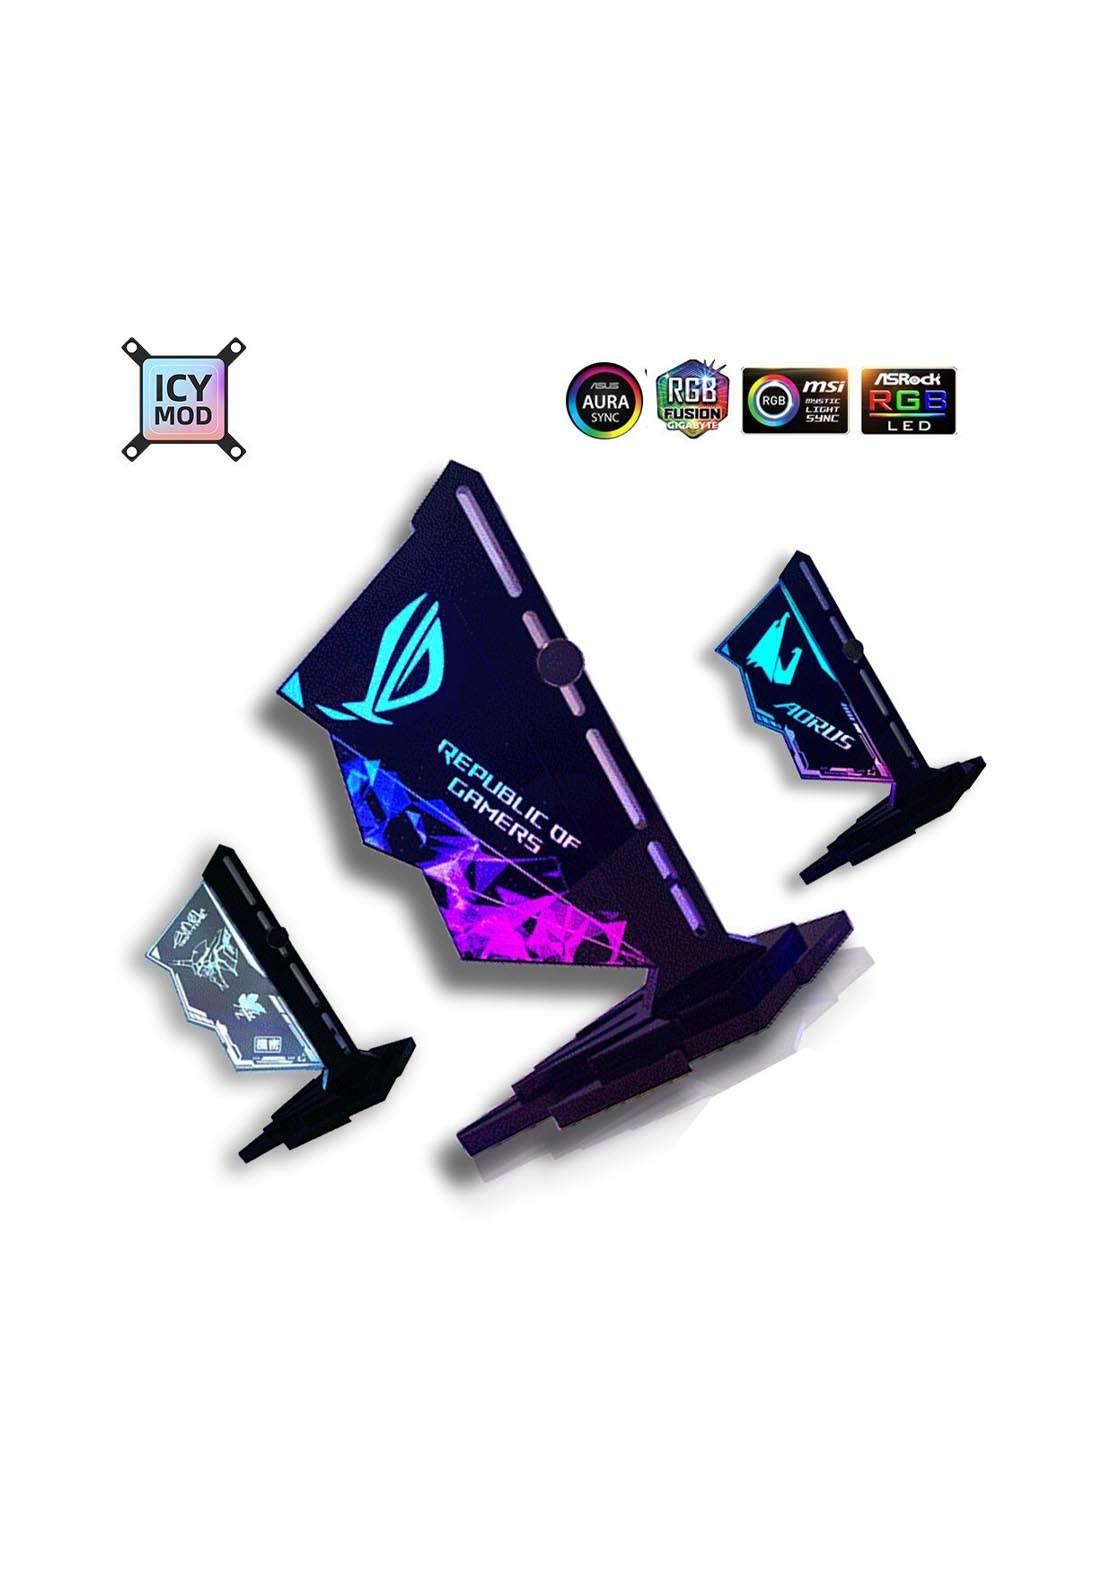 Bracket Vertical Acrylic VGA Holder RGB GPU Video Card Support 12V 4Pin - Black